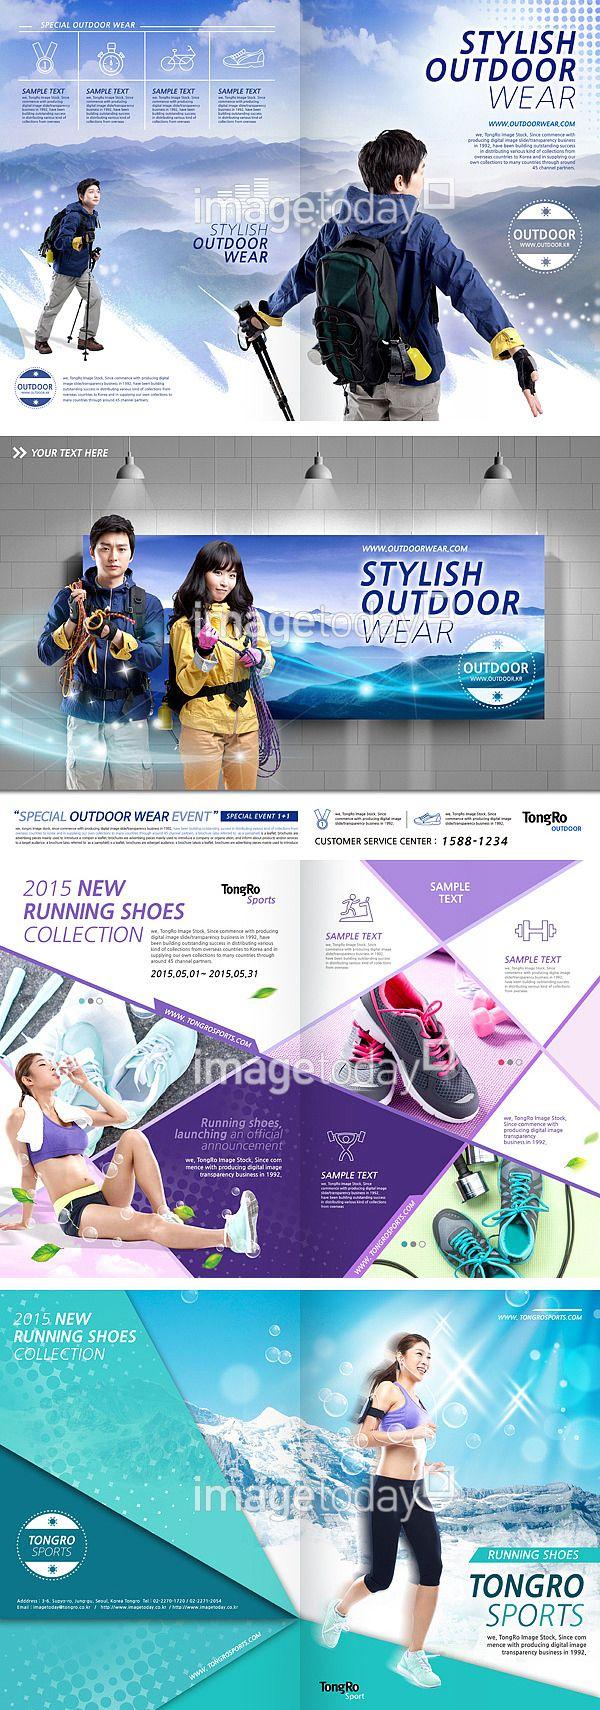 CG PSD 남자 등산 디자인소스 레이아웃 레저 브로슈어 블루 빛 산맥 스포츠 아웃도어 출판 편집디자인 표지 합성 홍보 이펙트 운동화 여자 운동 조깅 man design source layout leisure brochure blue effect light mountain publication composition sports outdoor woman exercise jogging #이미지투데이 #imagetoday #클립아트코리아 #clipartkorea #통로이미지 #tongroimages